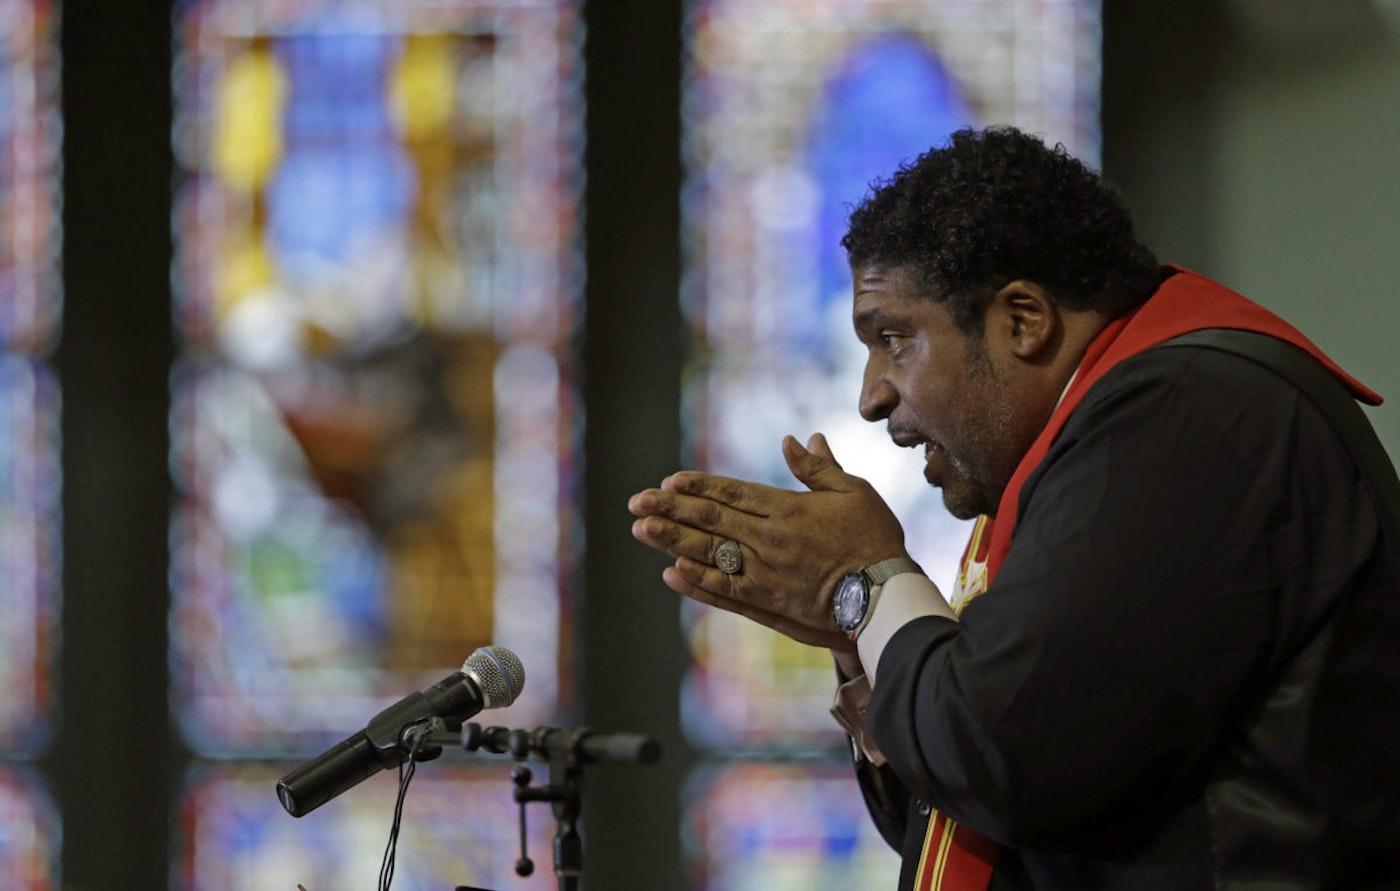 In this Wednesday, June 24, 2015 photo, Rev. William Barber speaks at Pullen Memorial Baptist Church in Raleigh, N.C.  (AP Photo/Gerry Broome)